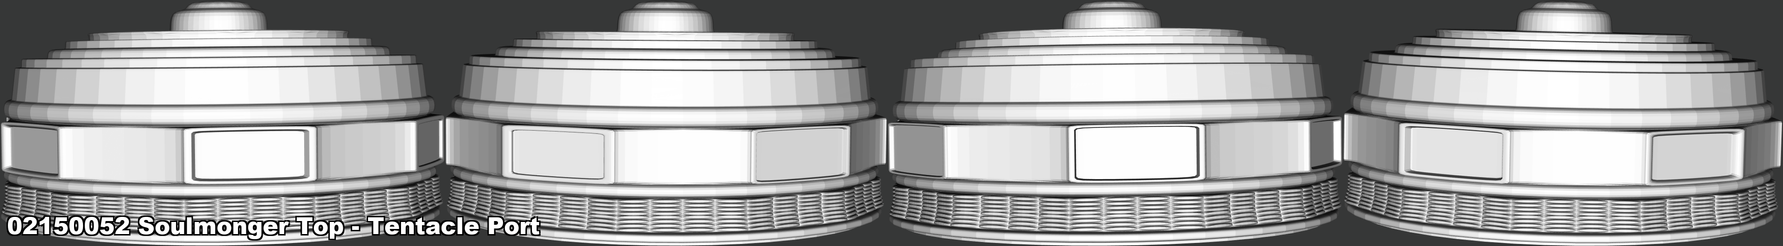 02150052 Soulmonger Top - Tentacle Port.